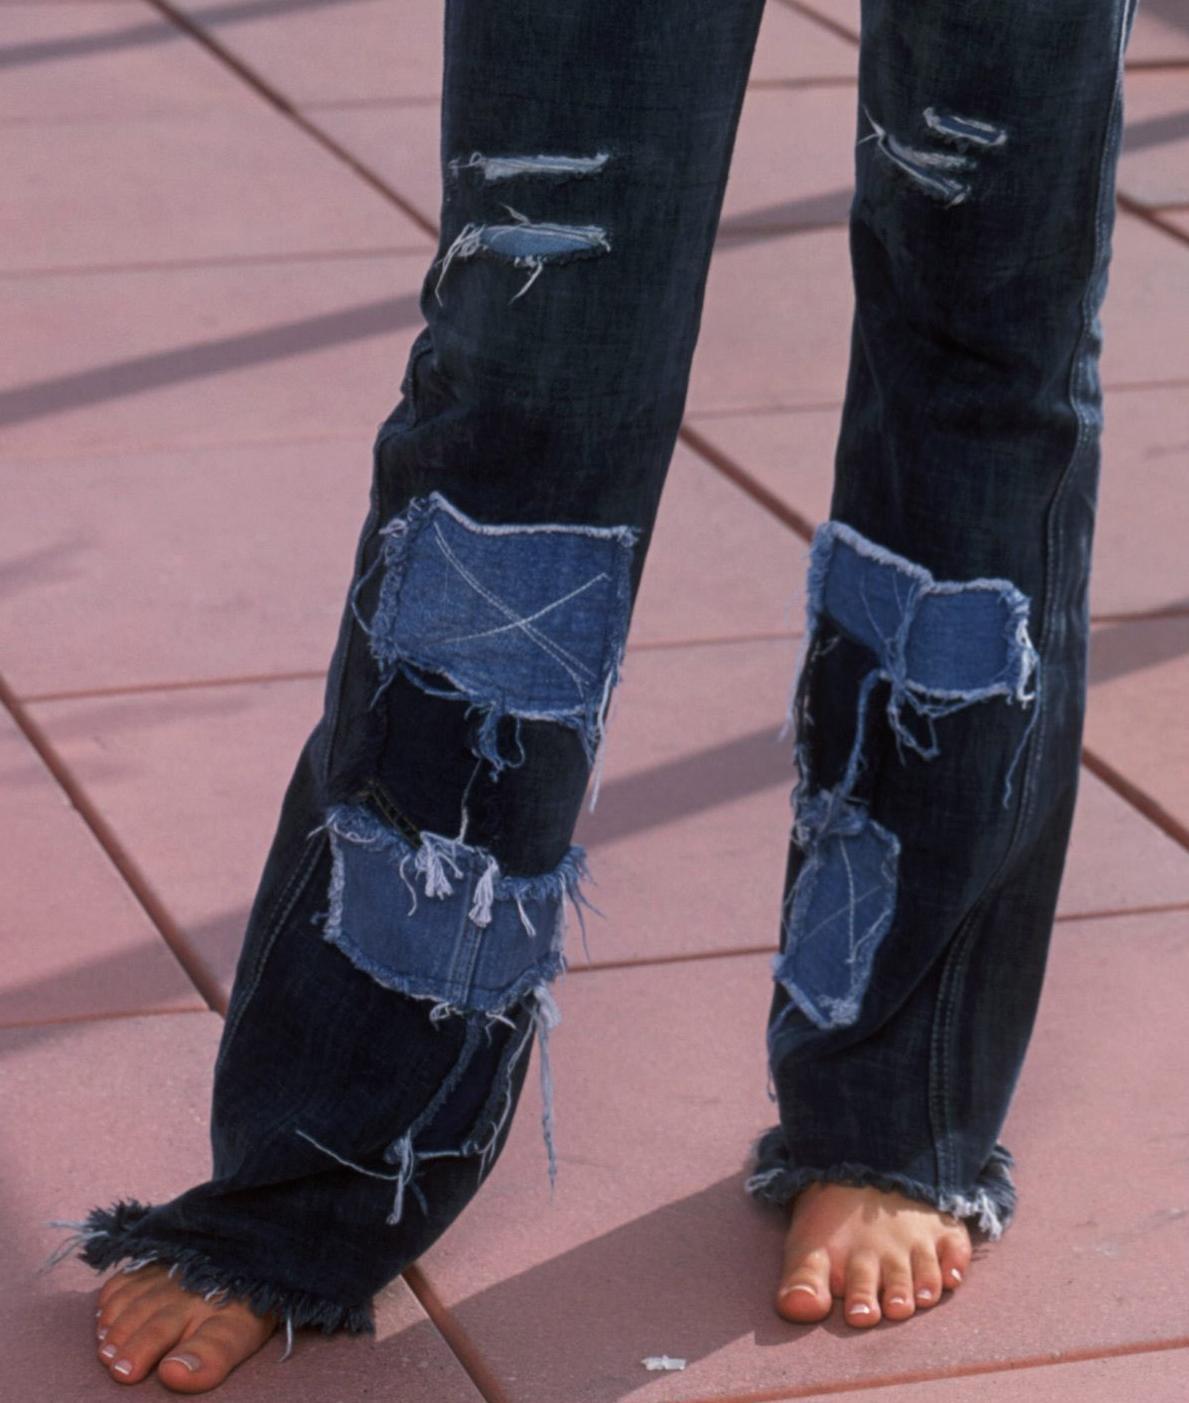 http://1.bp.blogspot.com/_UaLWp72nij4/S-McriNxD9I/AAAAAAAAJ4Q/I_DaWuxJmeo/s1600/joss-stone-feet-2.jpg